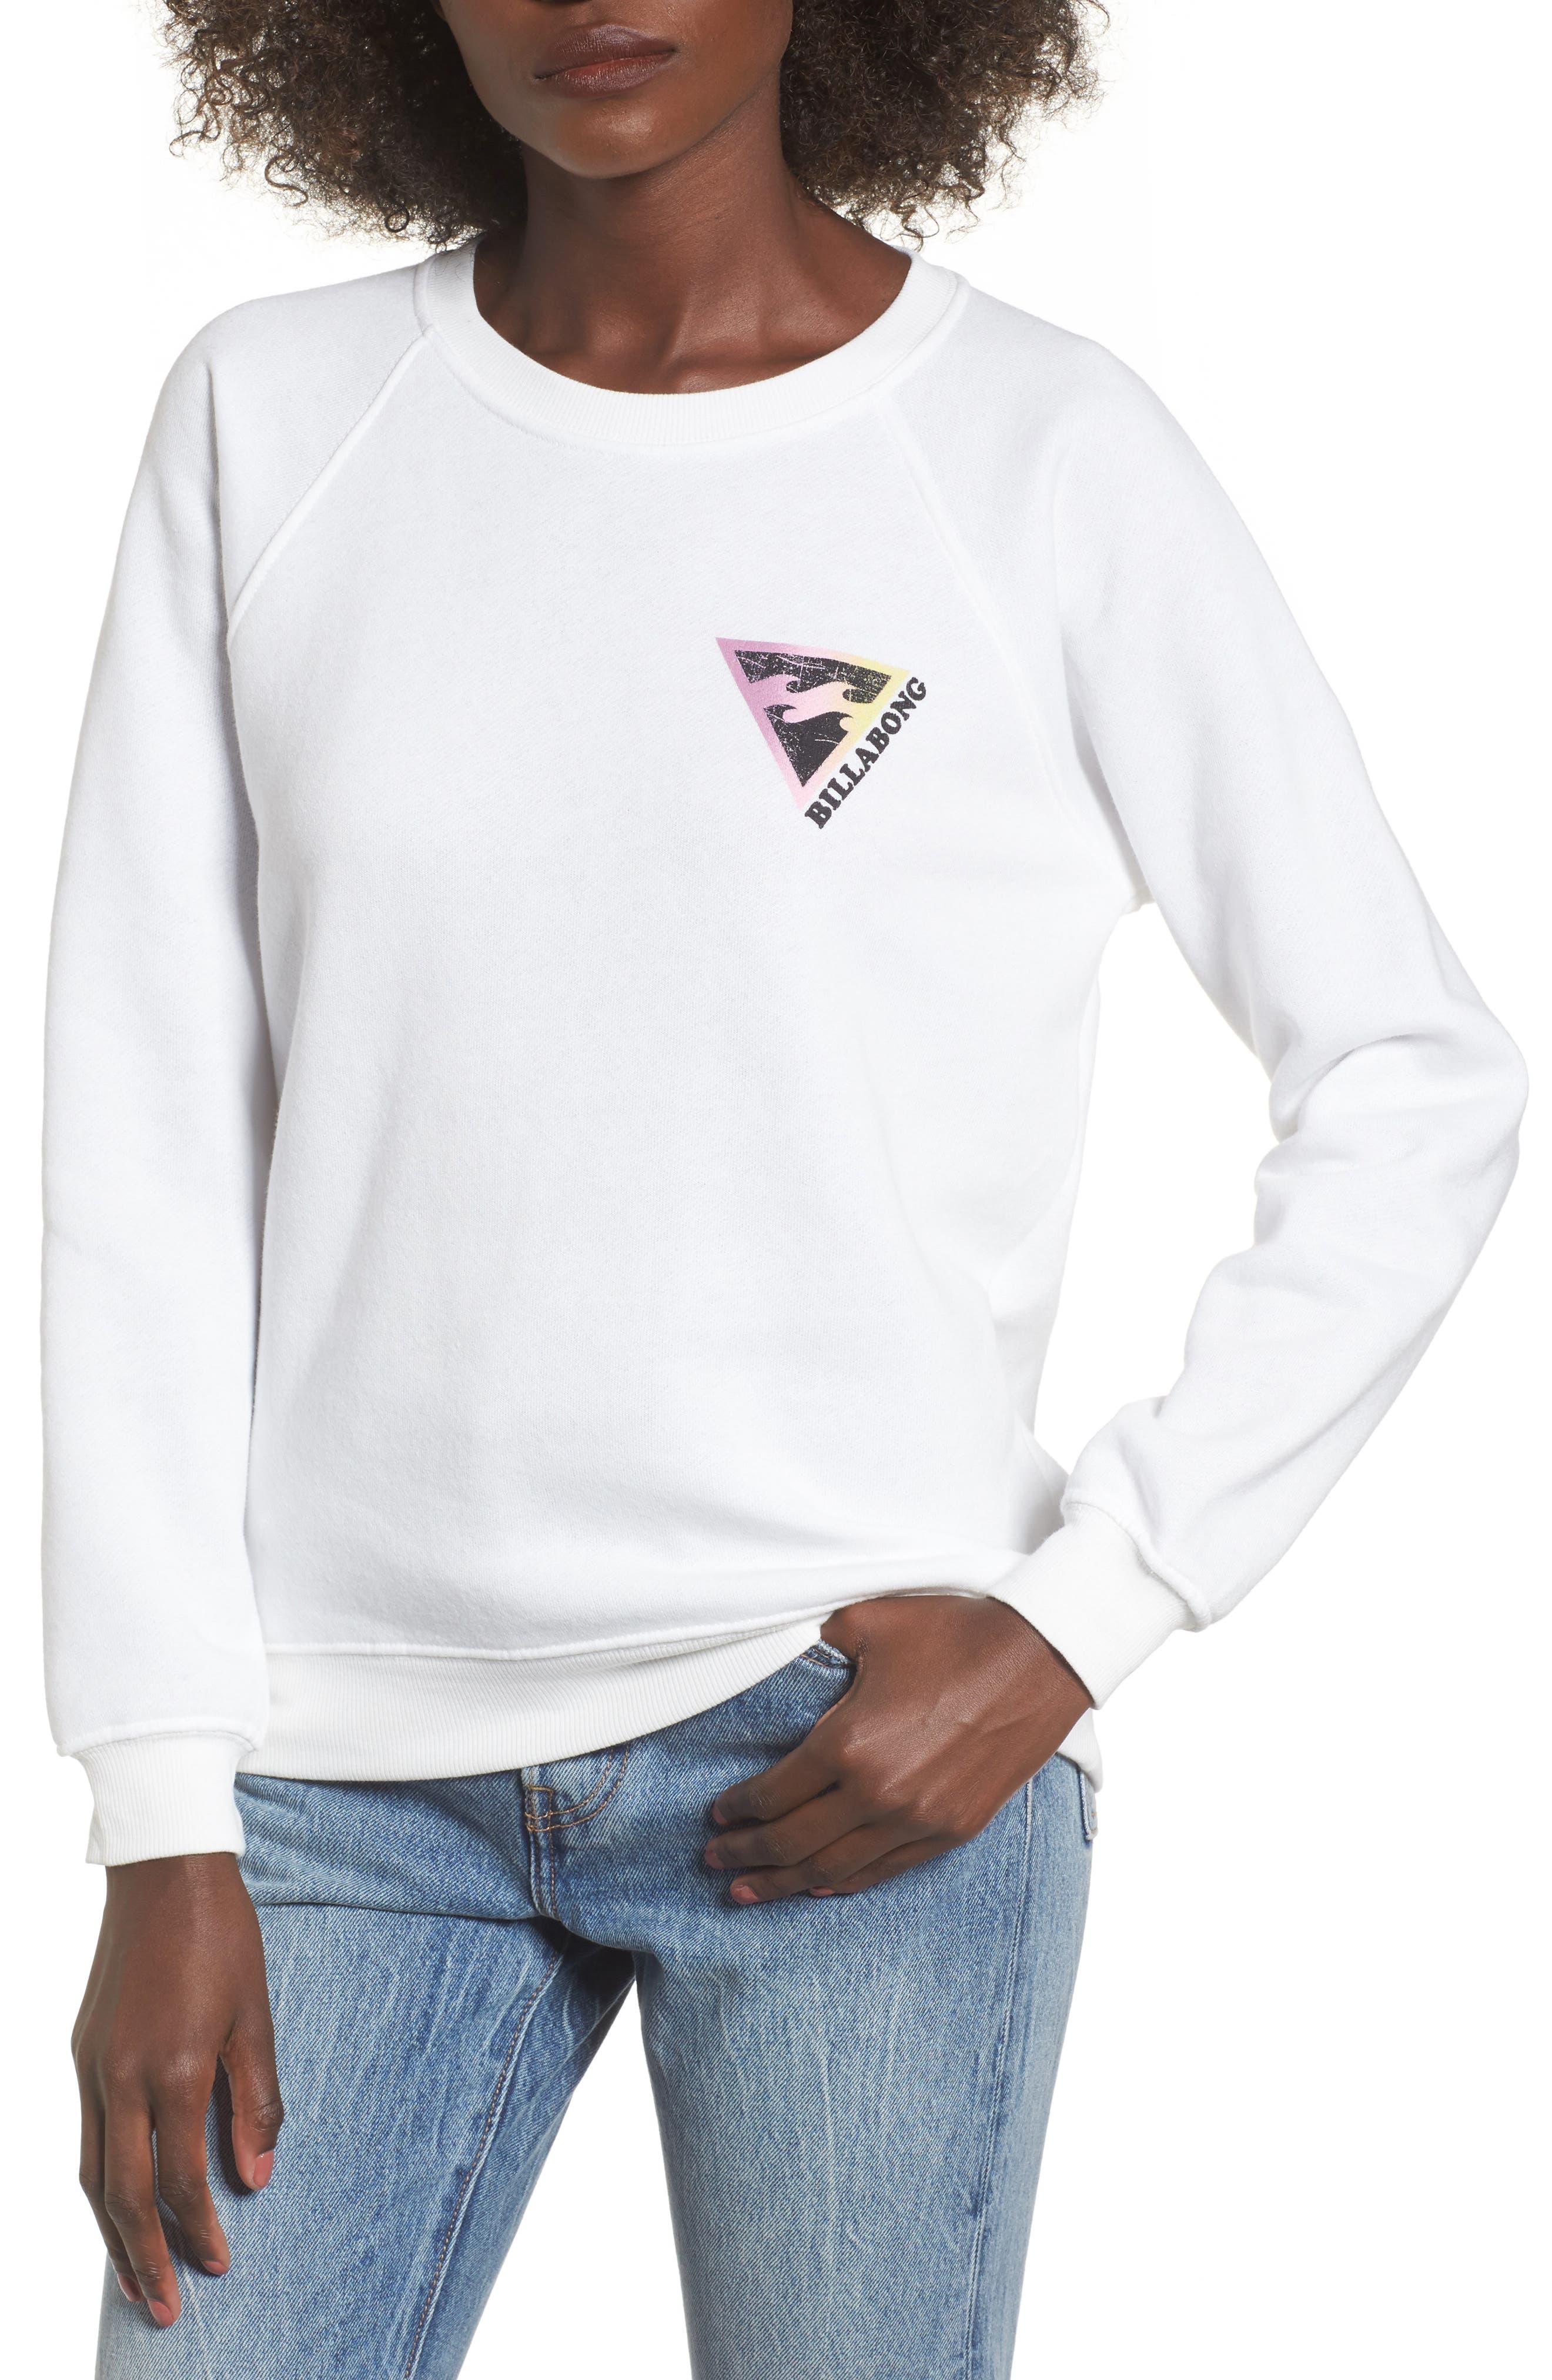 Since '73 Sweatshirt,                             Main thumbnail 1, color,                             Cool Wip